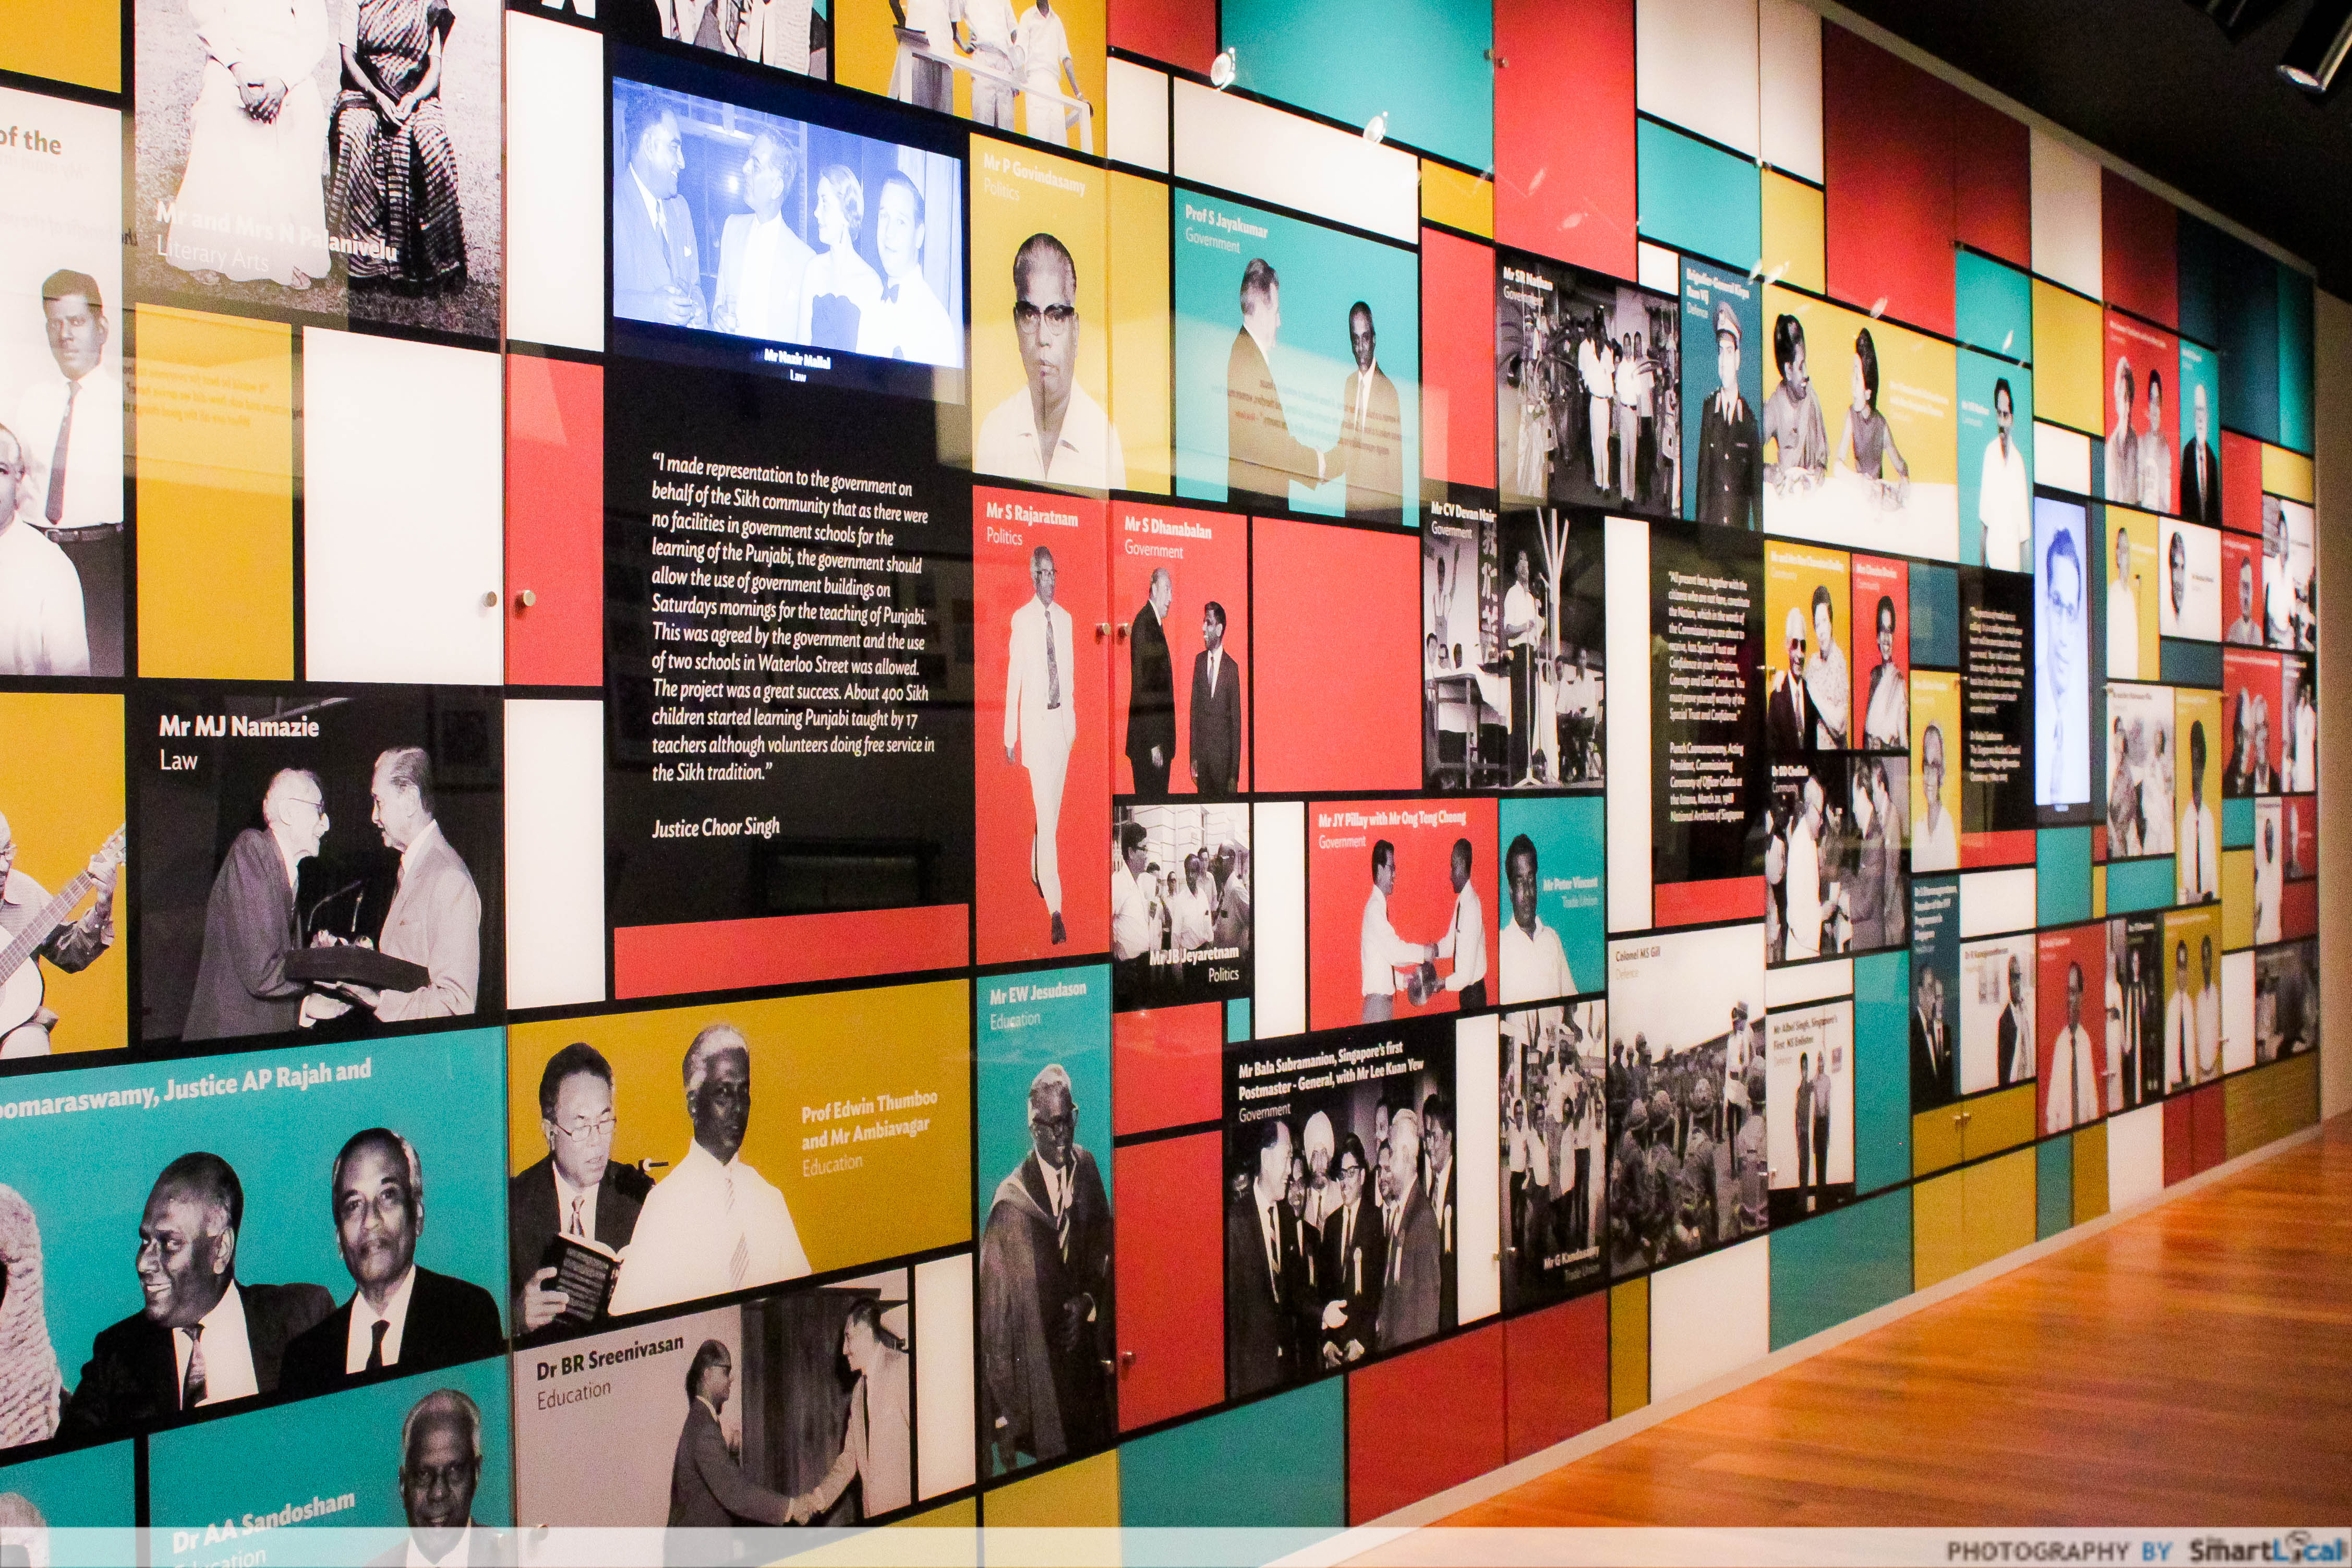 4.-Wall-of-fame.jpg